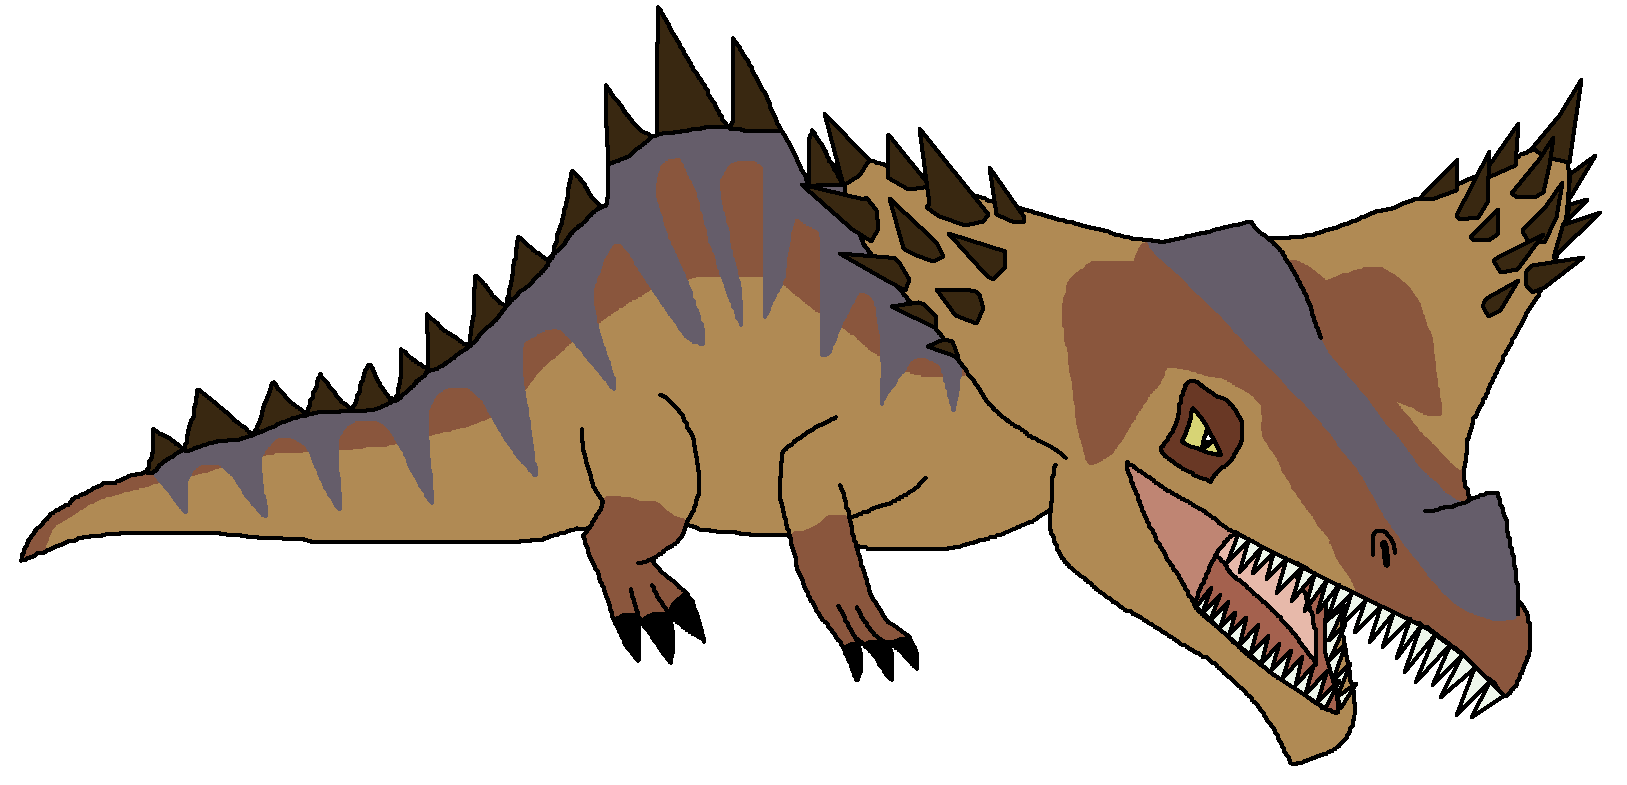 Crocodile clipart dinosaur. Image diplotator png pedia